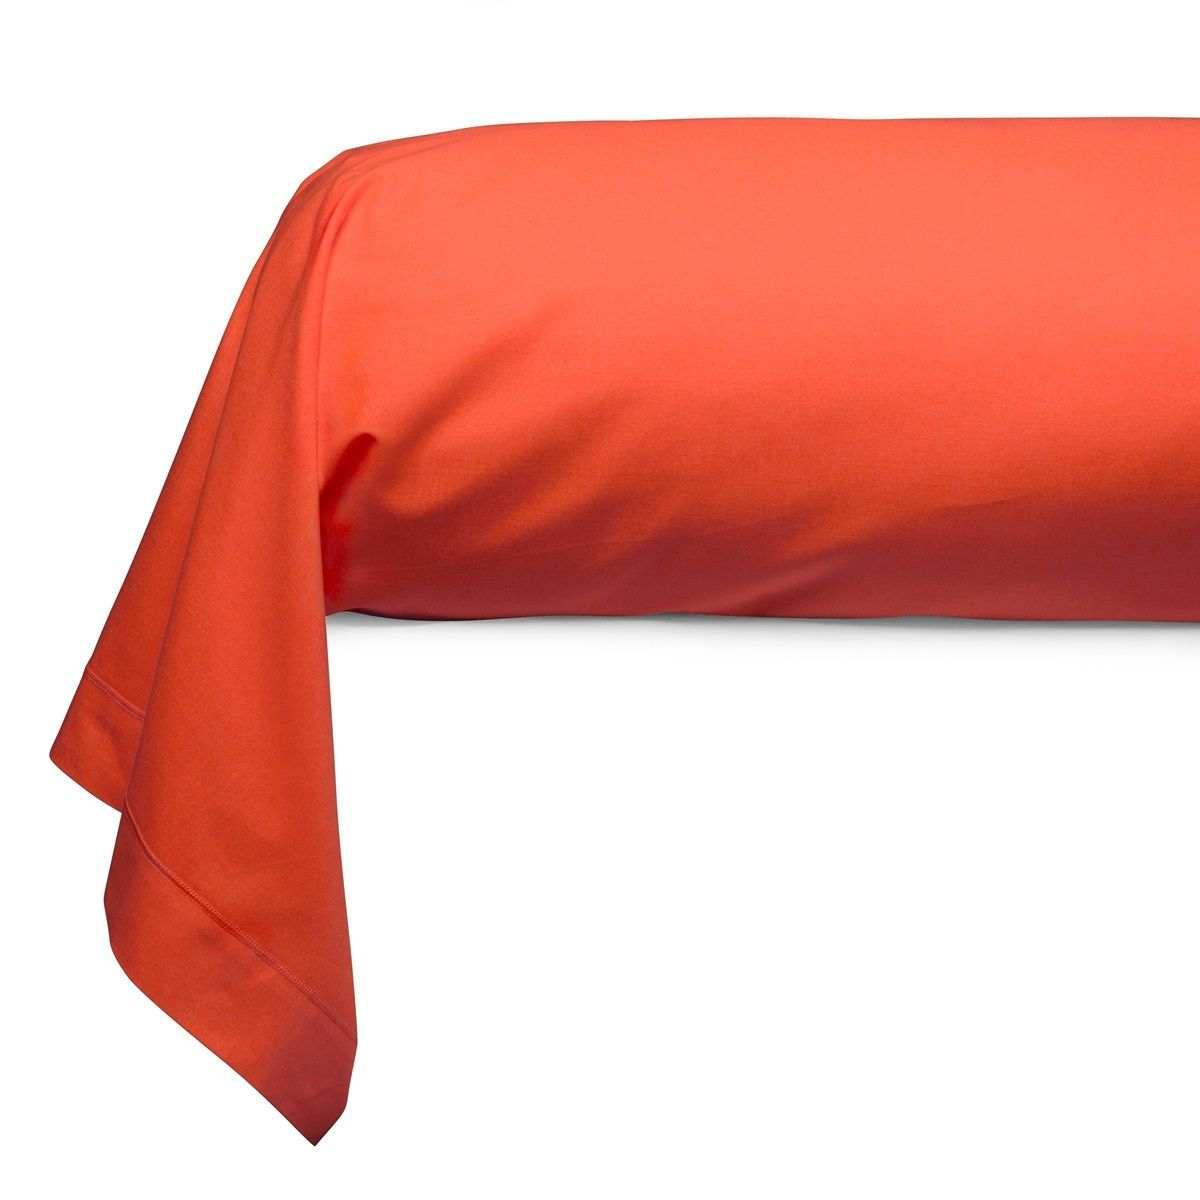 Cotton Bolster Case orange | Bed linen | Tradition des Vosges